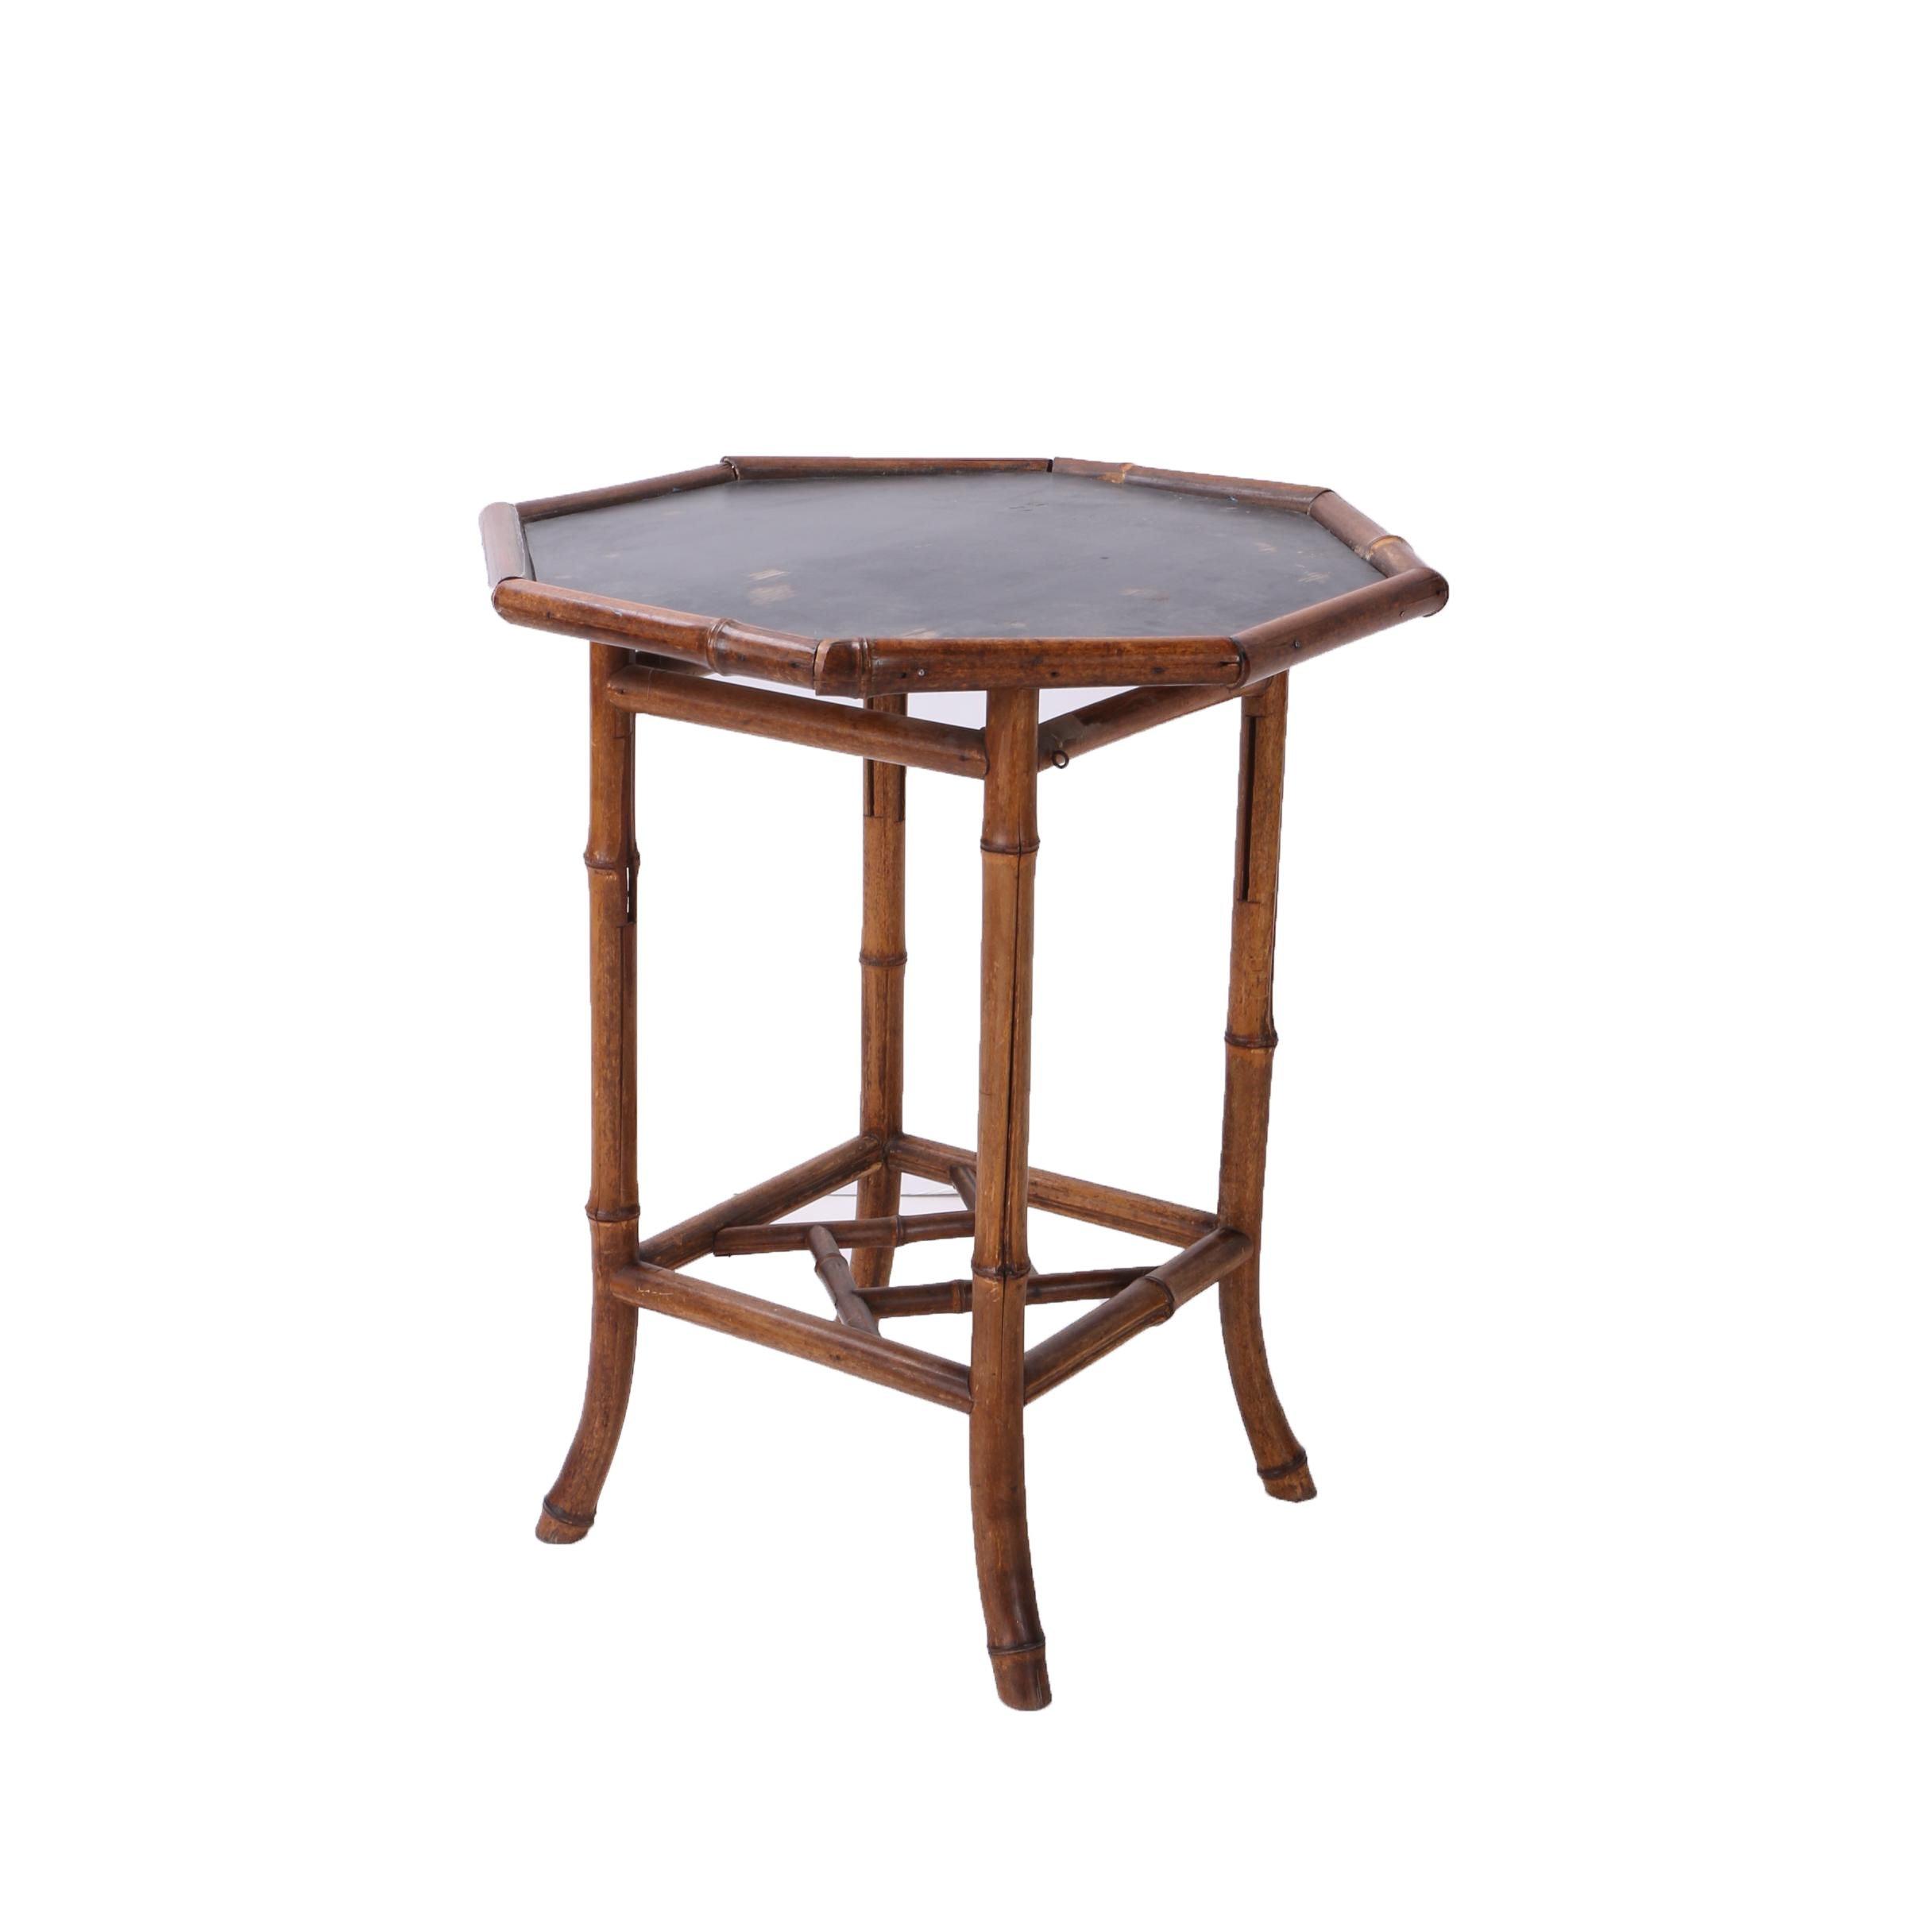 19th Century English Brighton Bamboo Accent Table